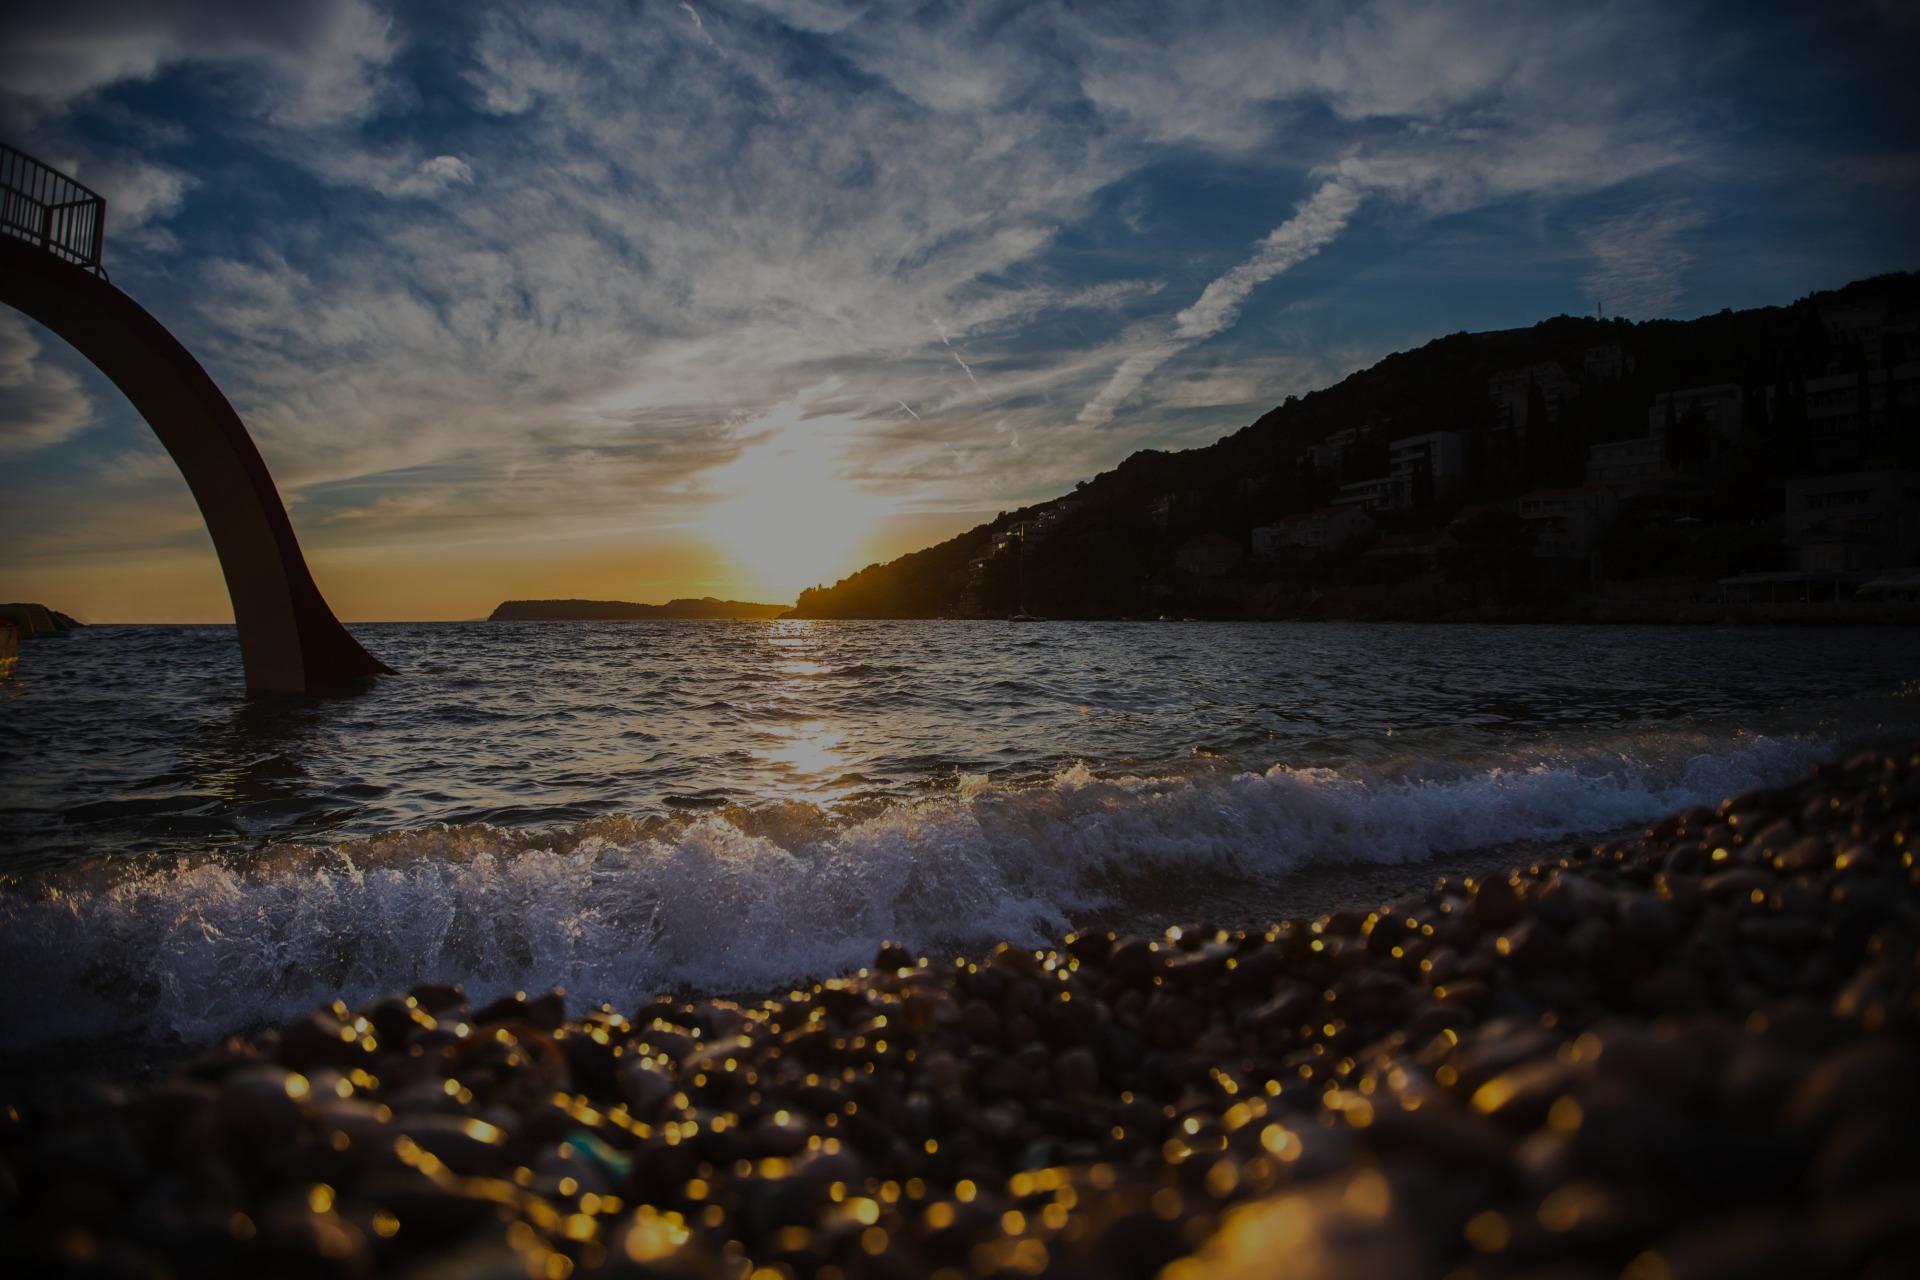 sunset beach dubrovnik uvala